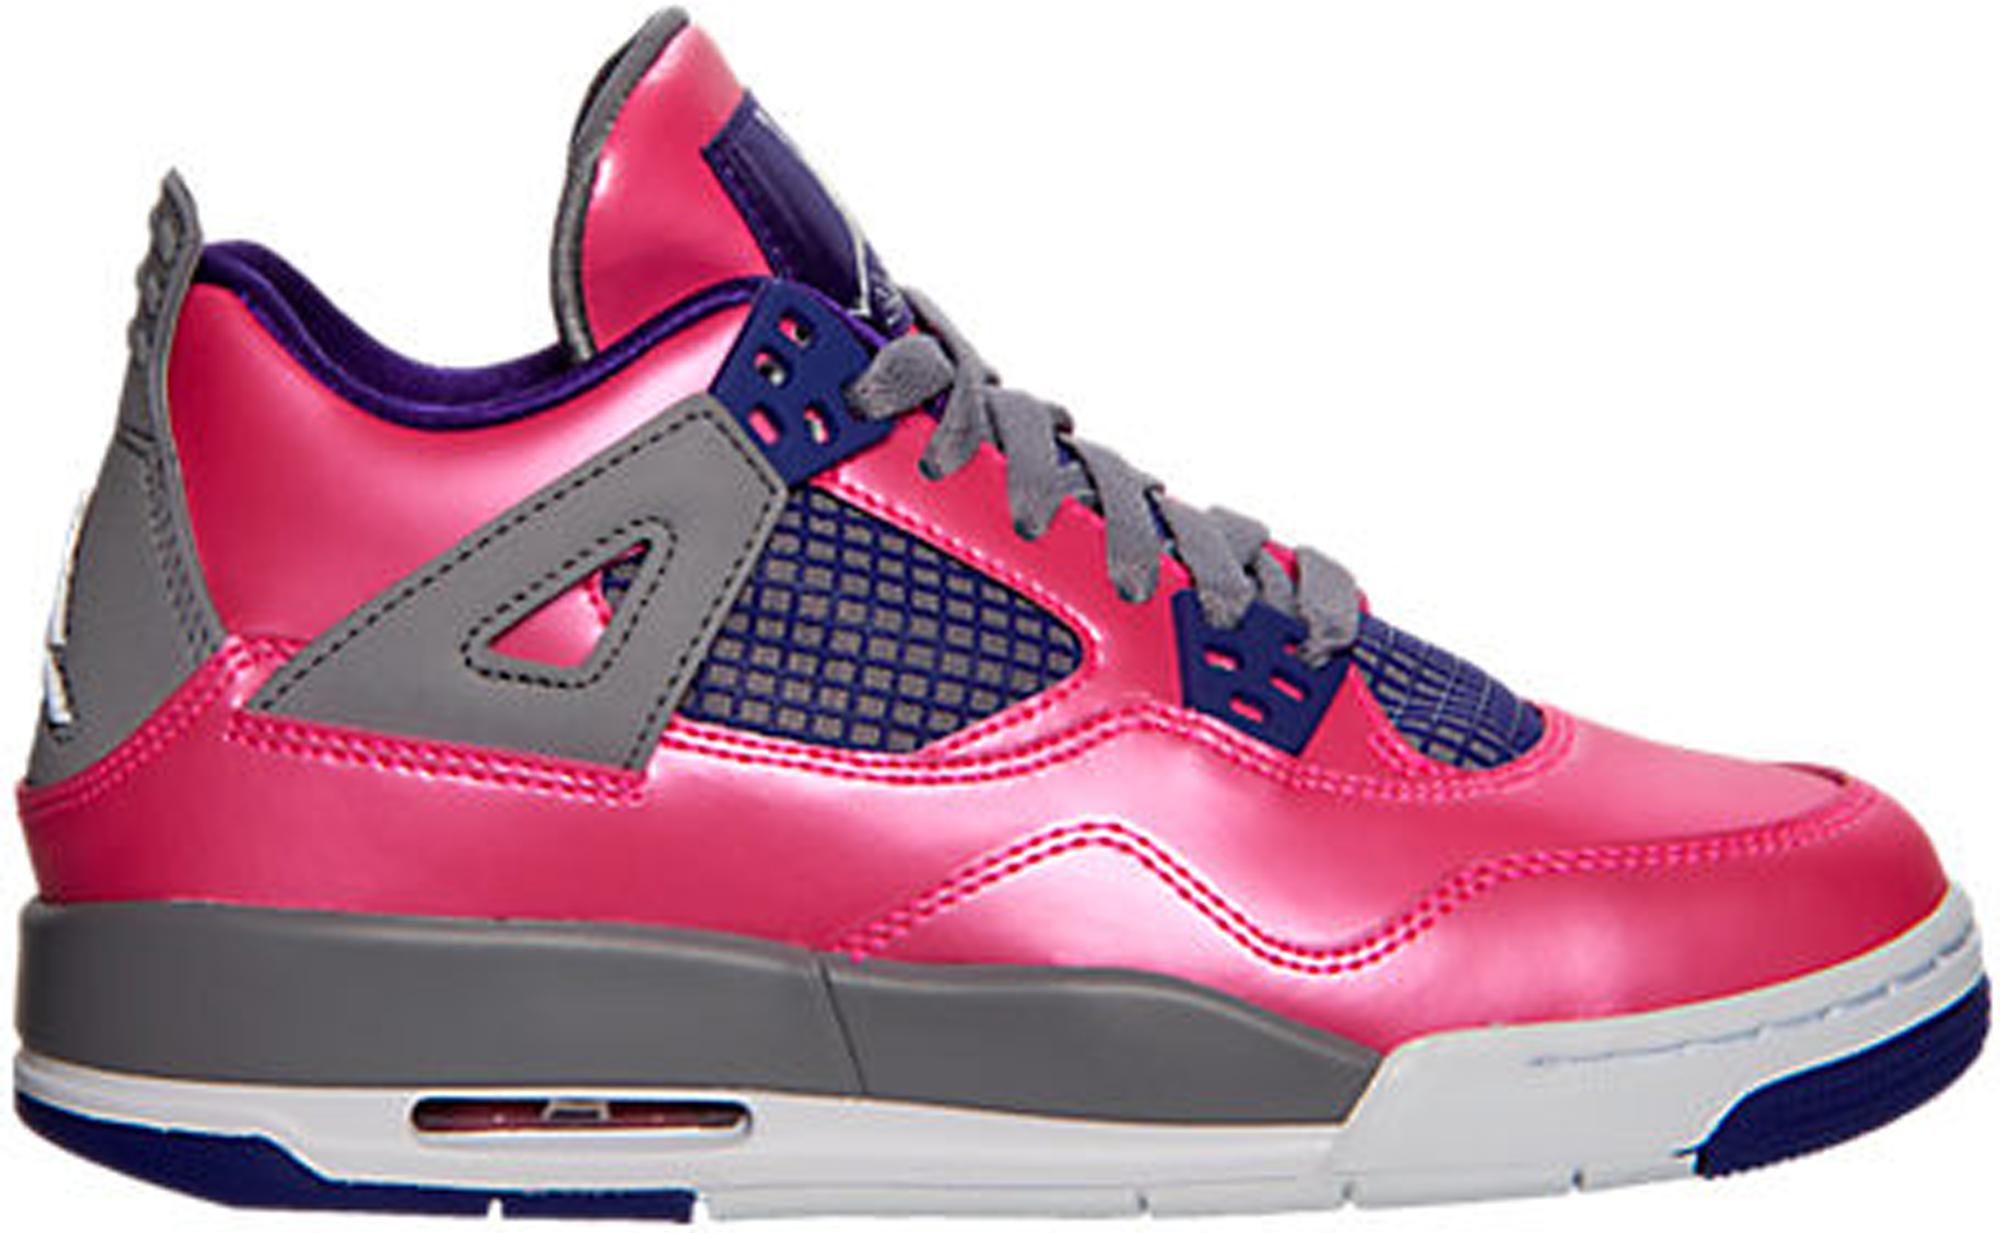 Jordan 4 Retro Pink Foil (GS)